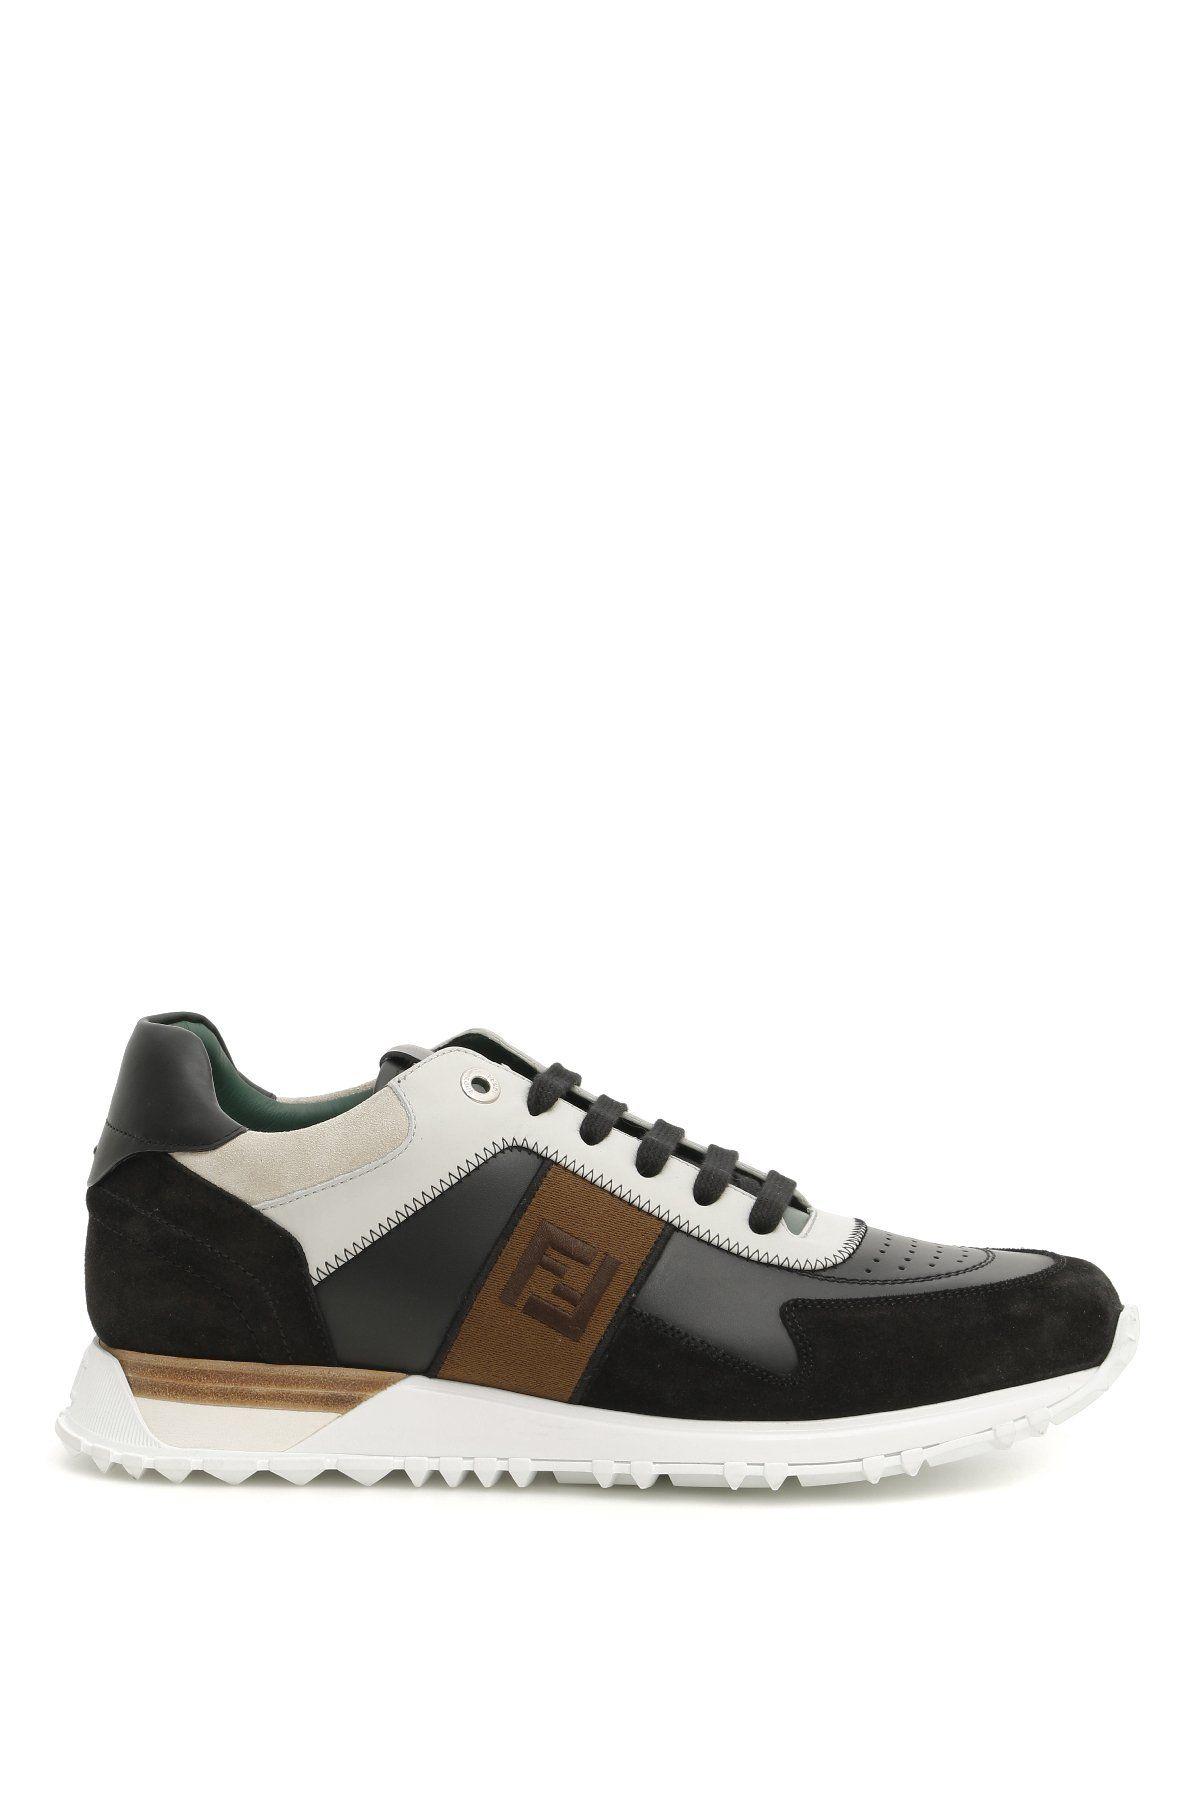 4c923d57b7d FENDI FENDI FF LOGO SNEAKERS.  fendi  shoes